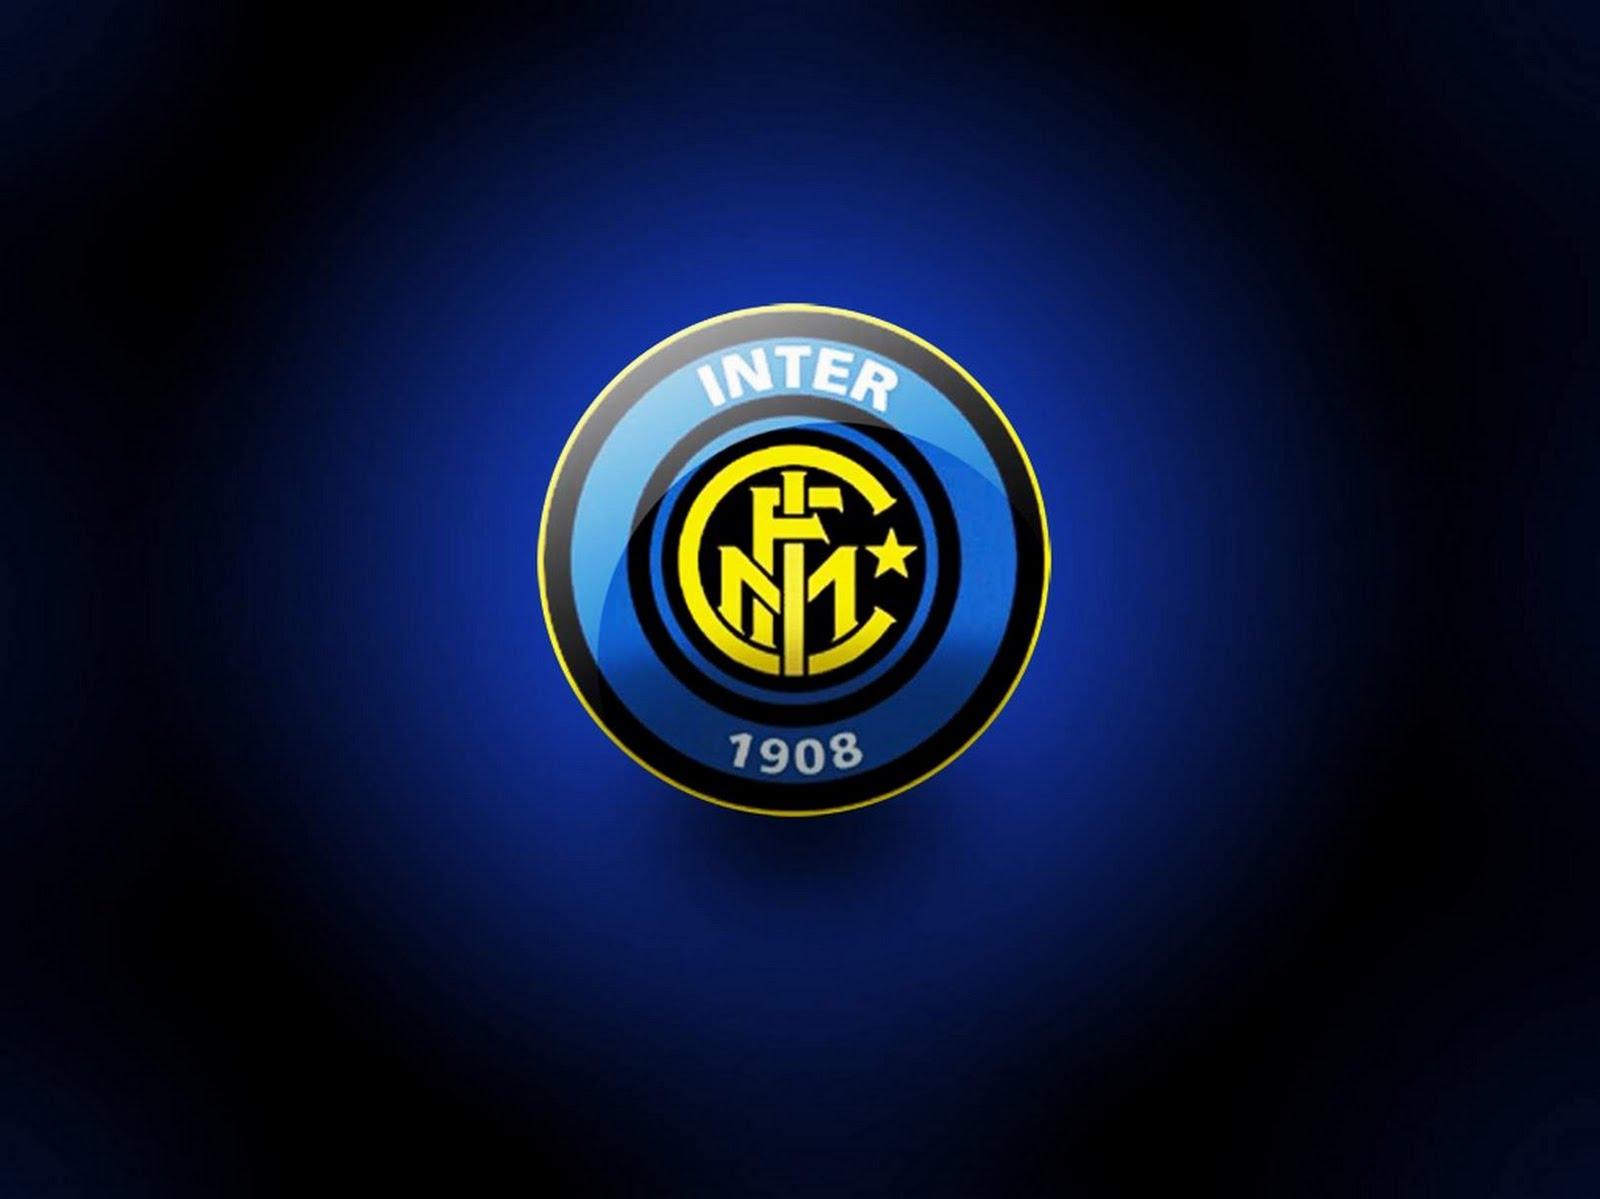 F.C. Barcelona Milano Real Internazionale Madrid 2012: And